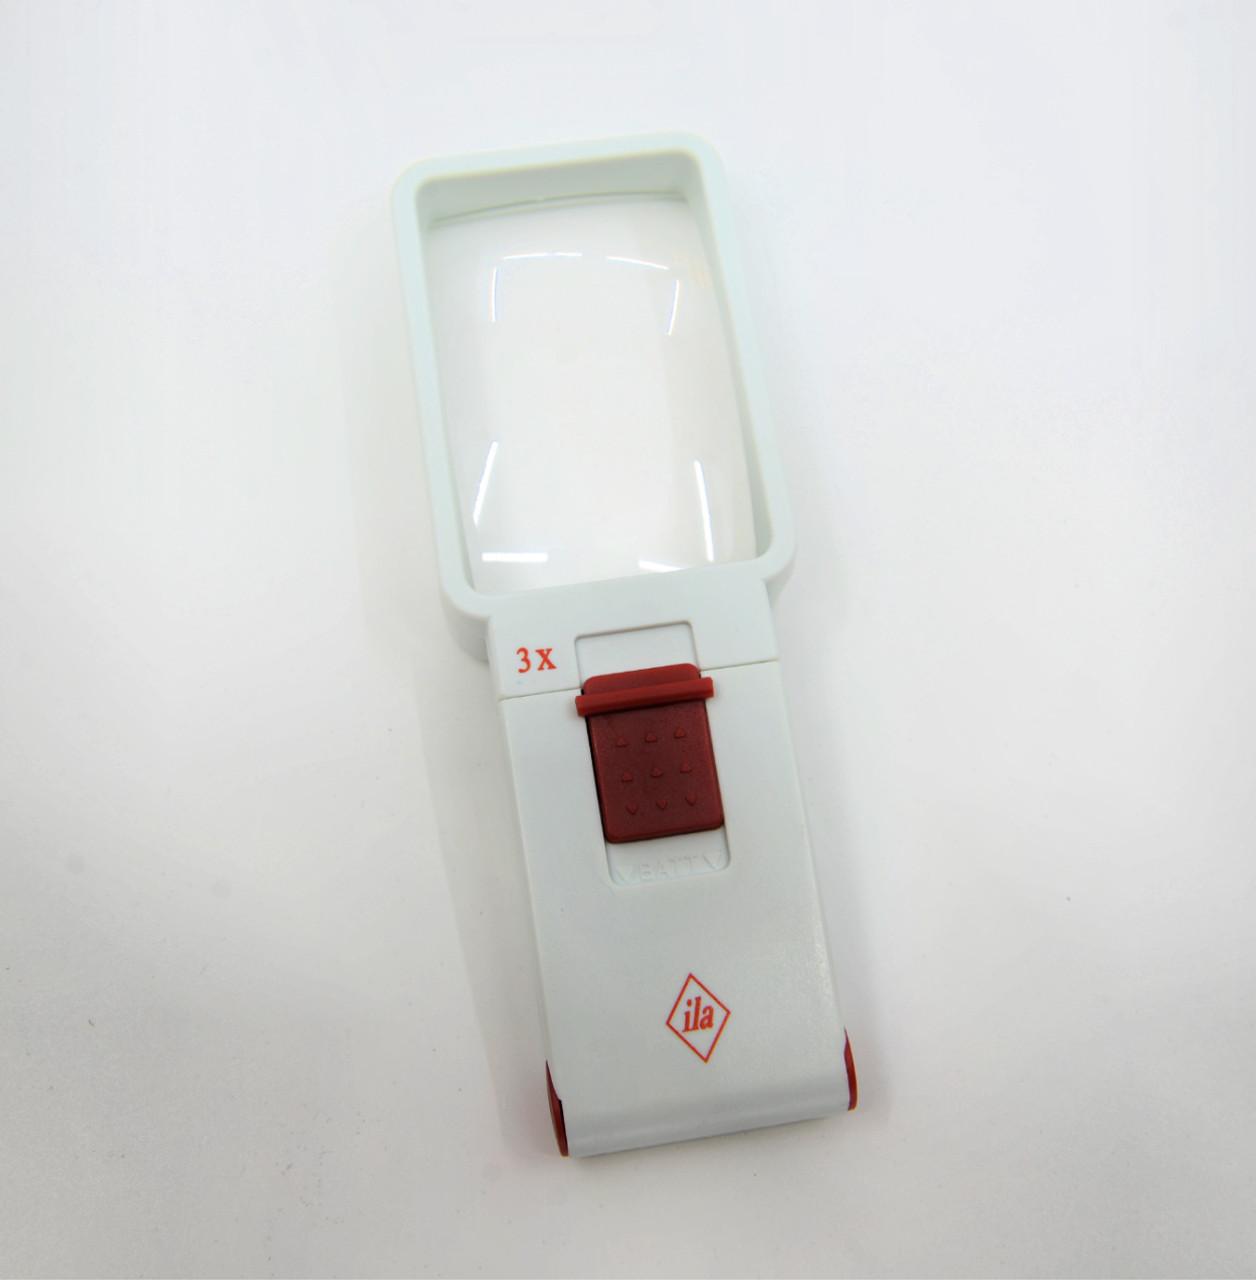 3X ila LED Hand Held Illuminated Magnifier